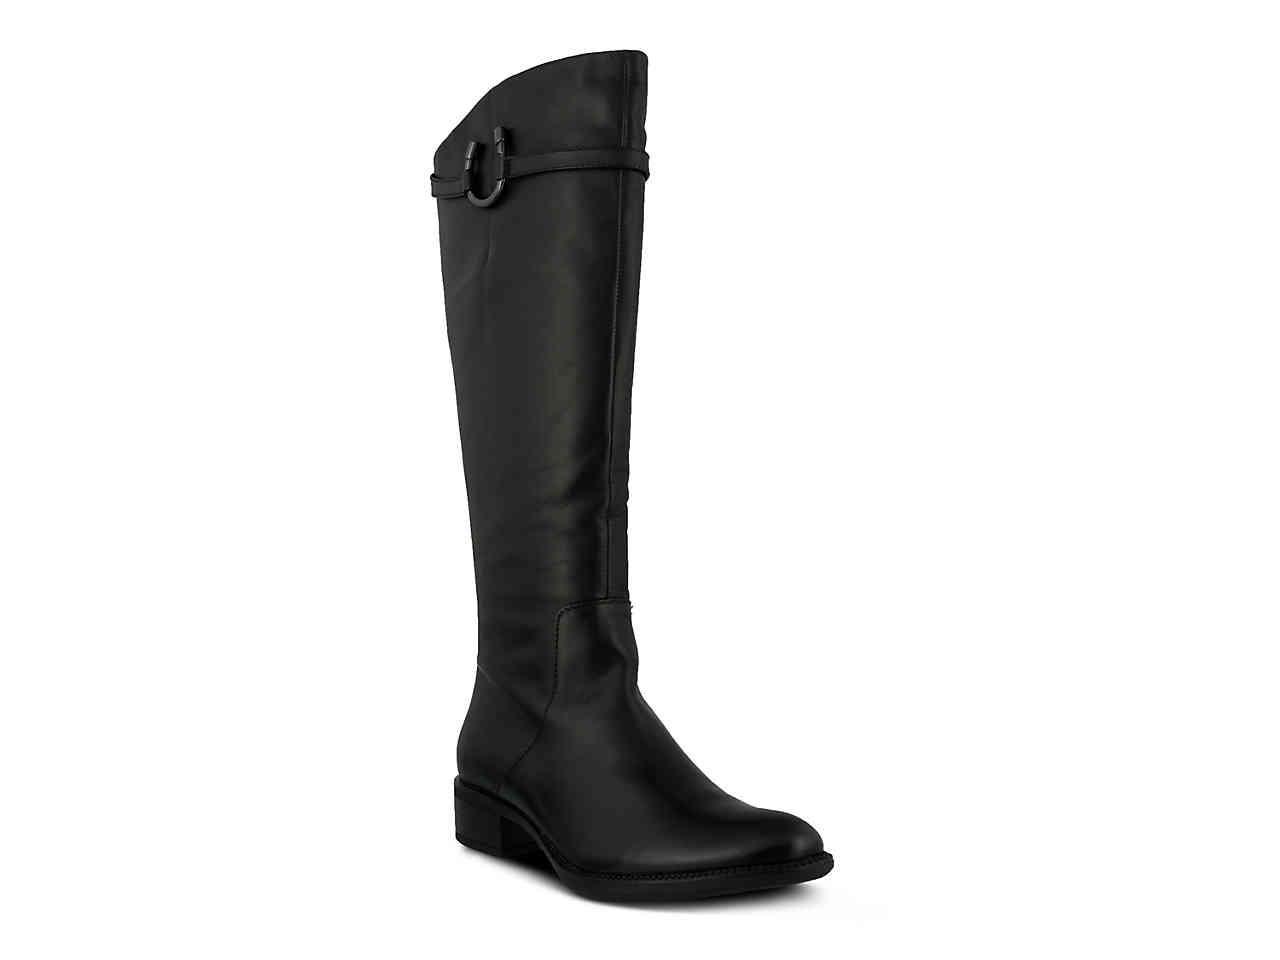 Spring Step. Women's Black Delano Riding Boot